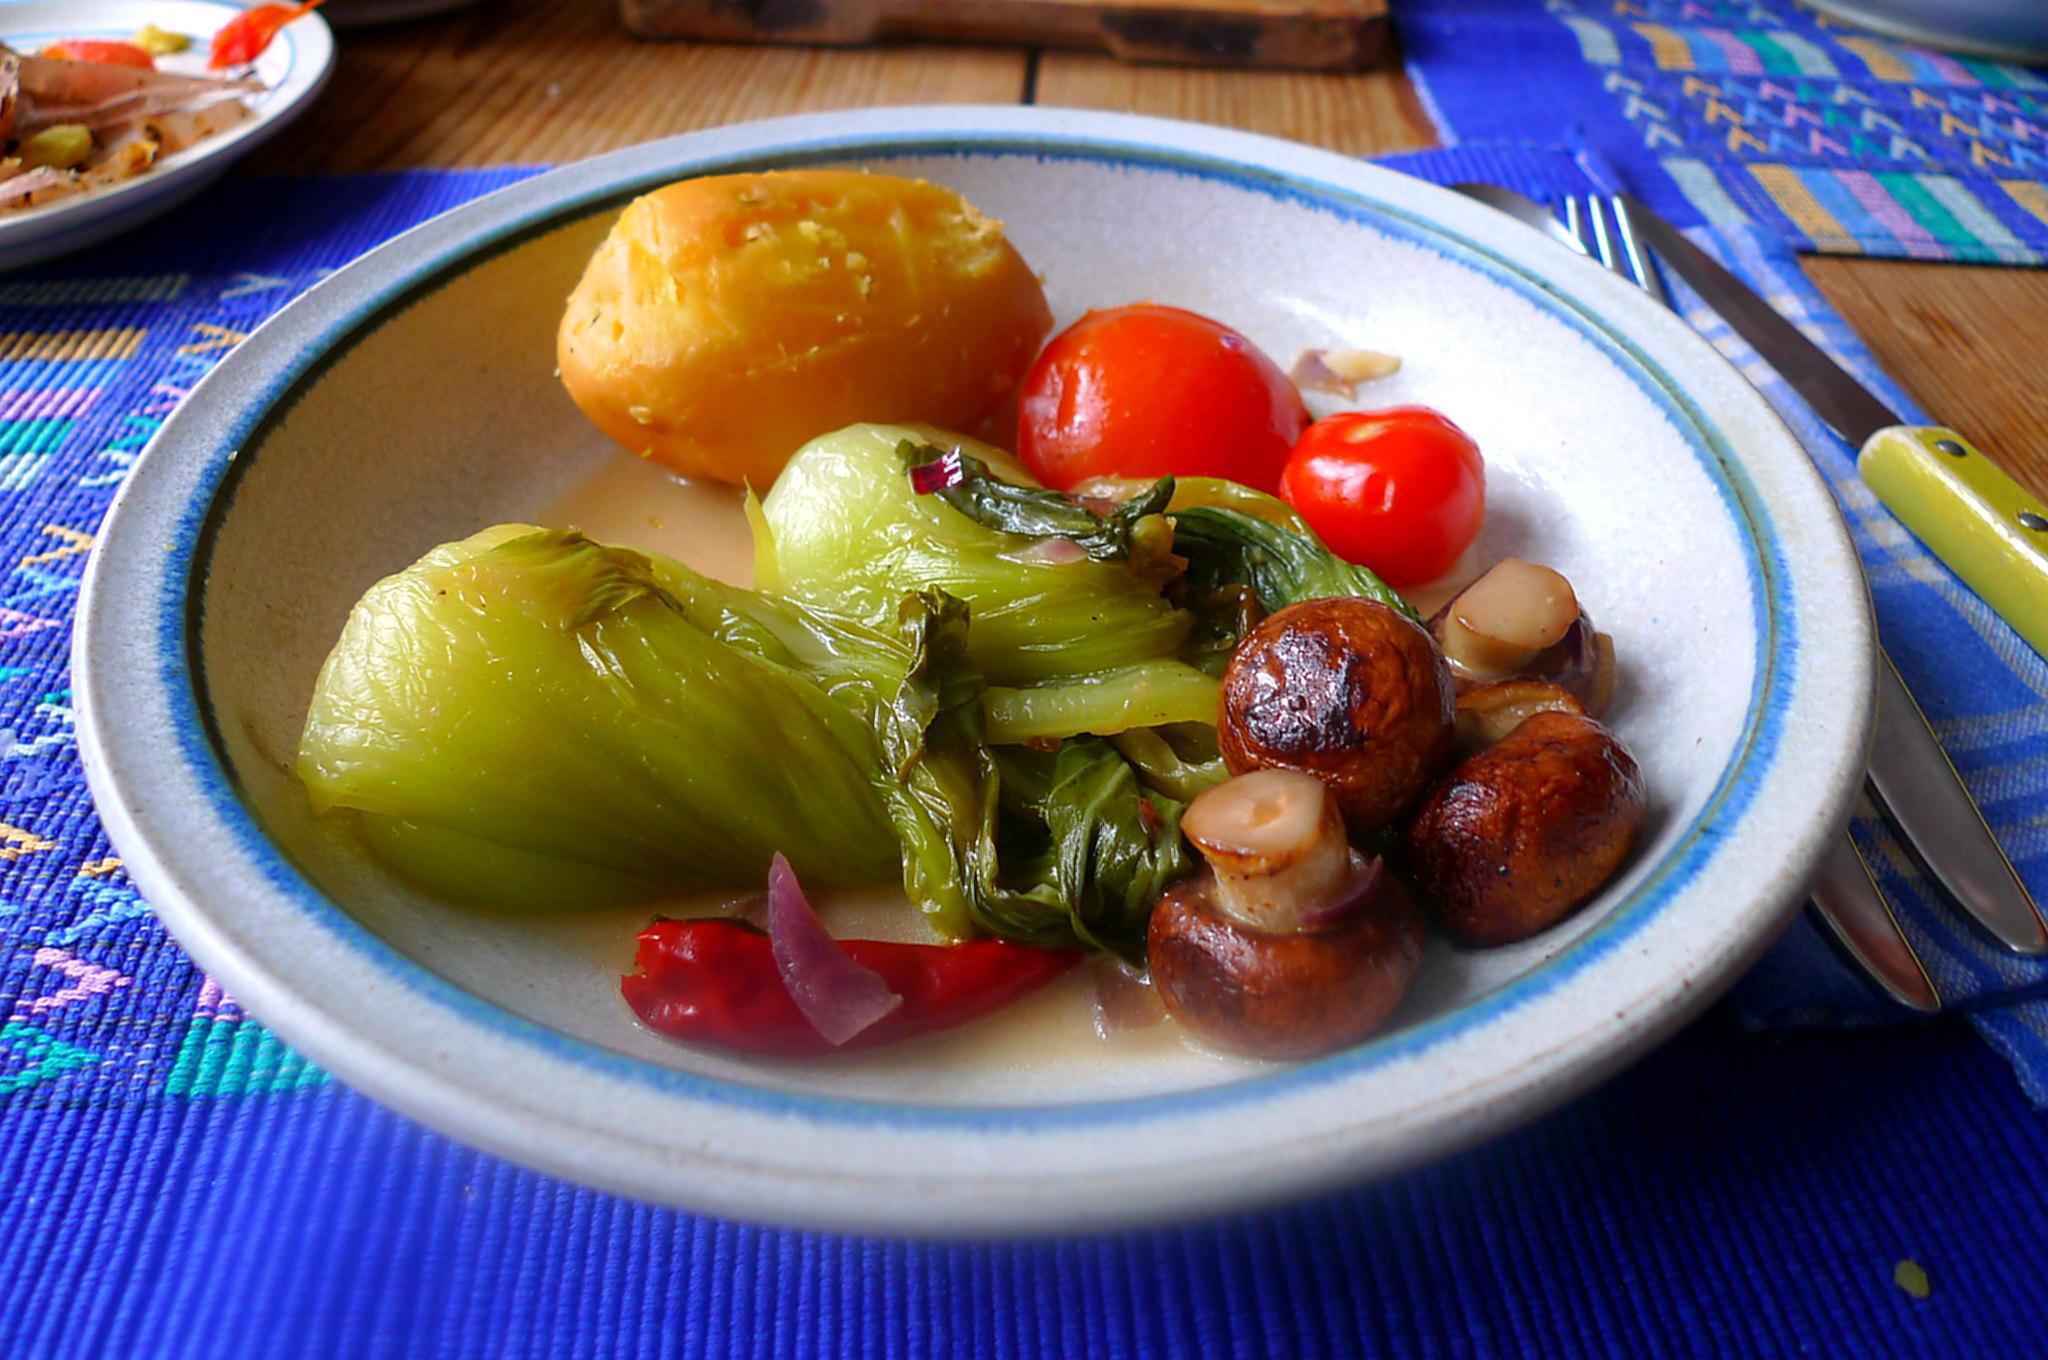 pak-choitomatenchampignonkartoffelnvegetarisch-16